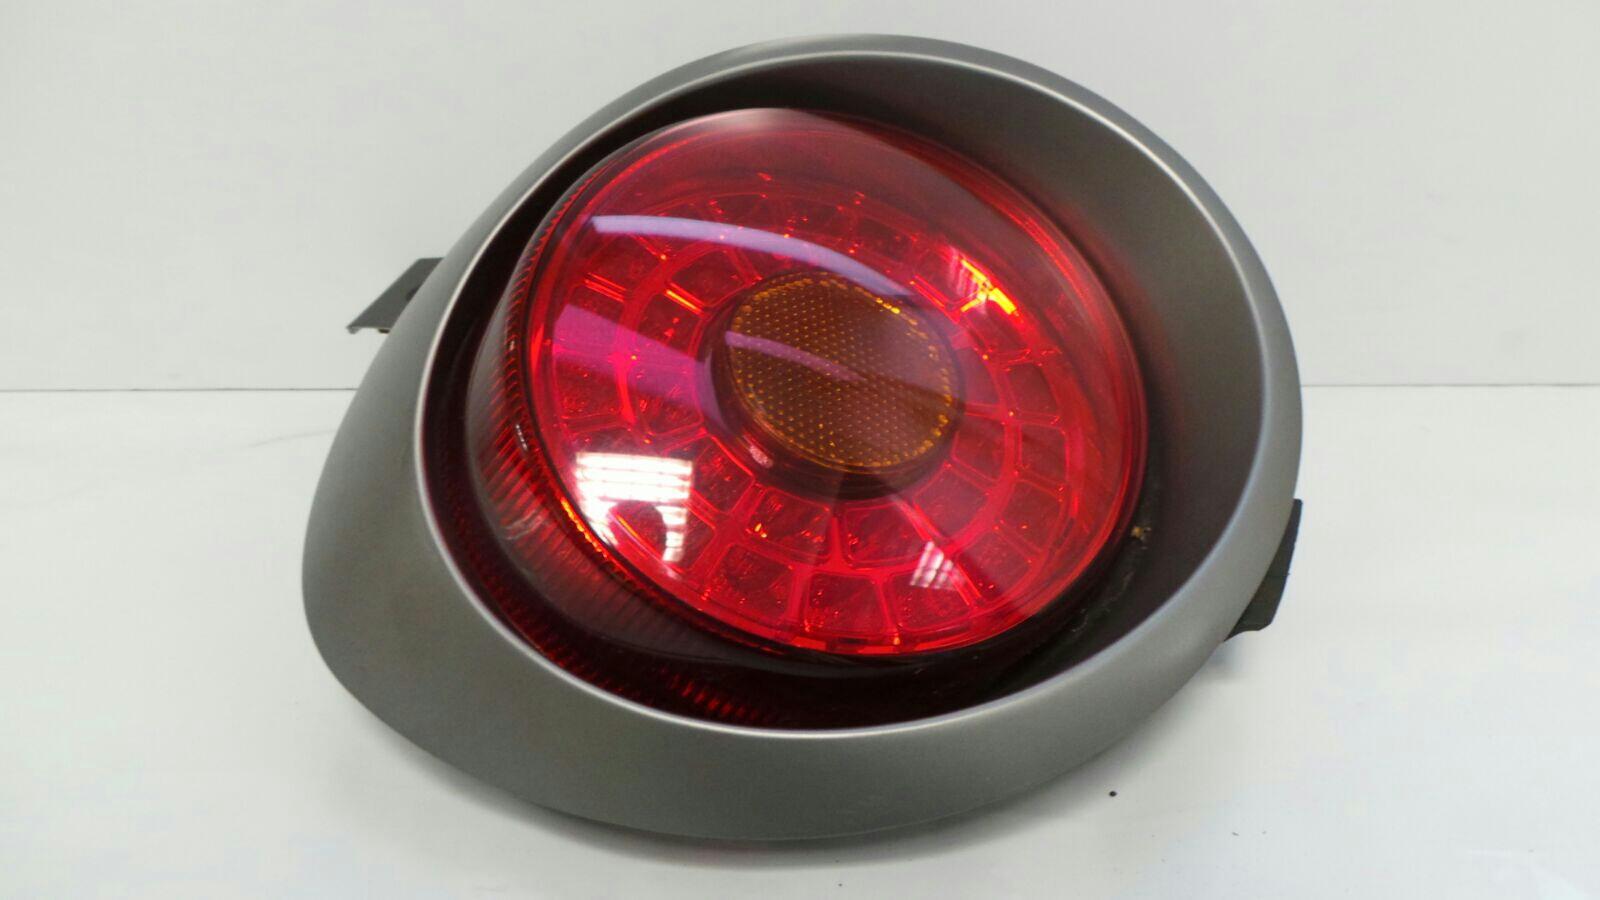 Alfa Romeo Mito 2008 To 2016 Lamp Assembly Rear Lh Petrol Manual Tail Lights Light 08 16 3 Door Hatch Passenger 5193878